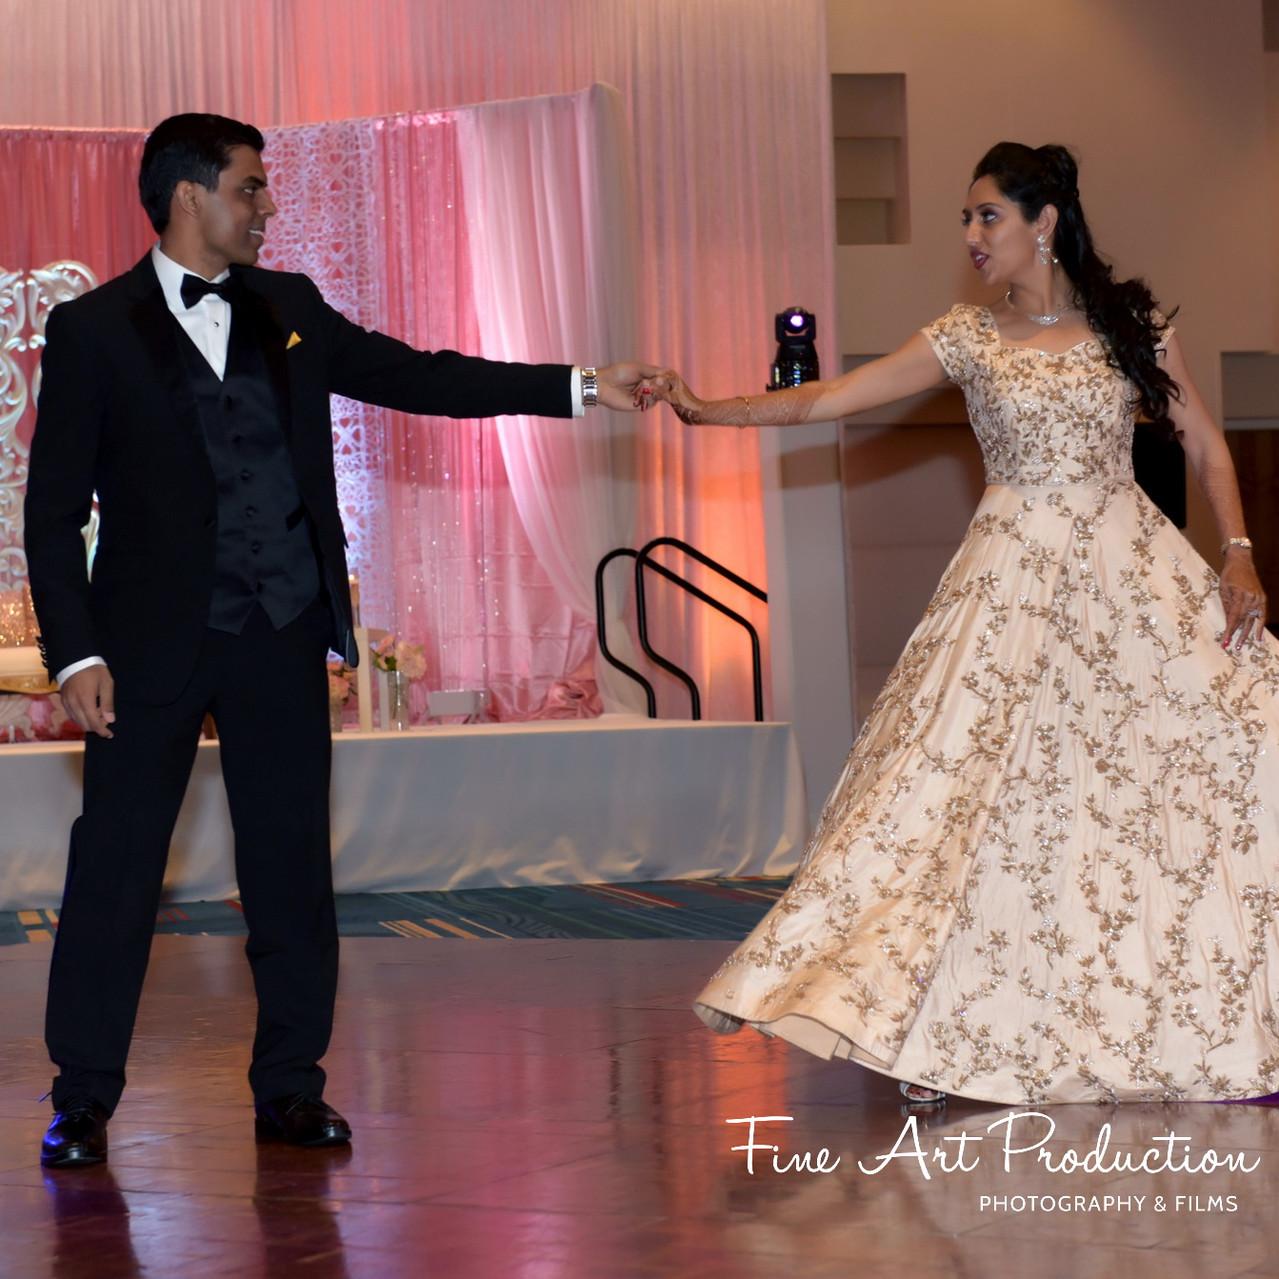 Hyatt-Regency-Grand-Cypress-Indian-Wedding-Reception-Photography-Fine-Art-Production-Amish-Thakkar_22